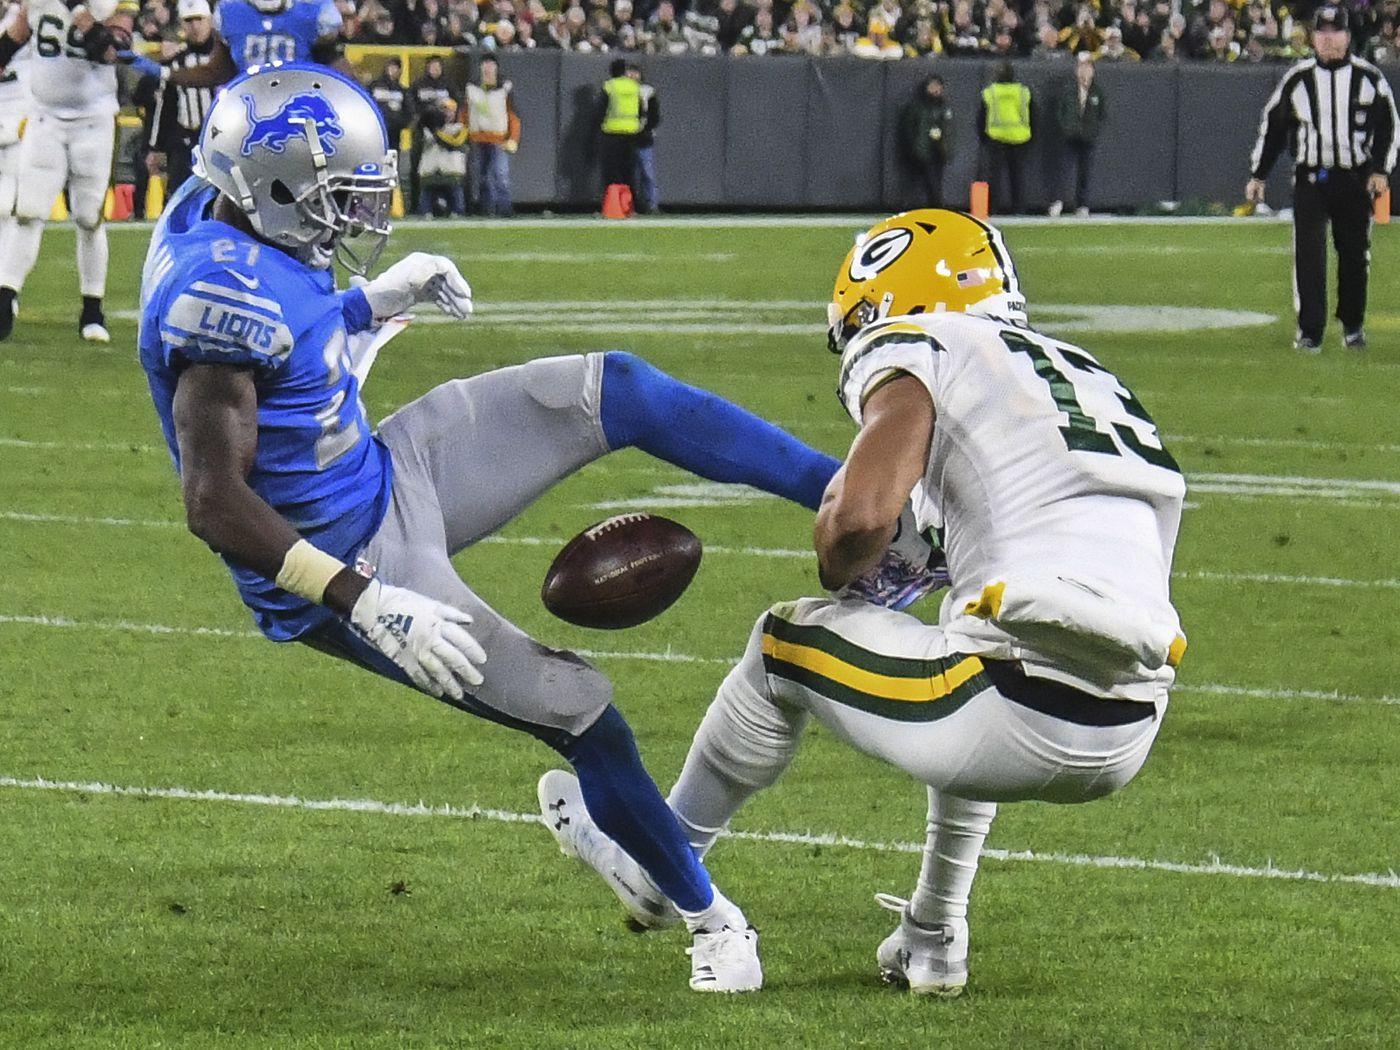 Nfl Week 2 Picks Detroit Lions Vs Green Bay Packers Score Predictions Pride Of Detroit